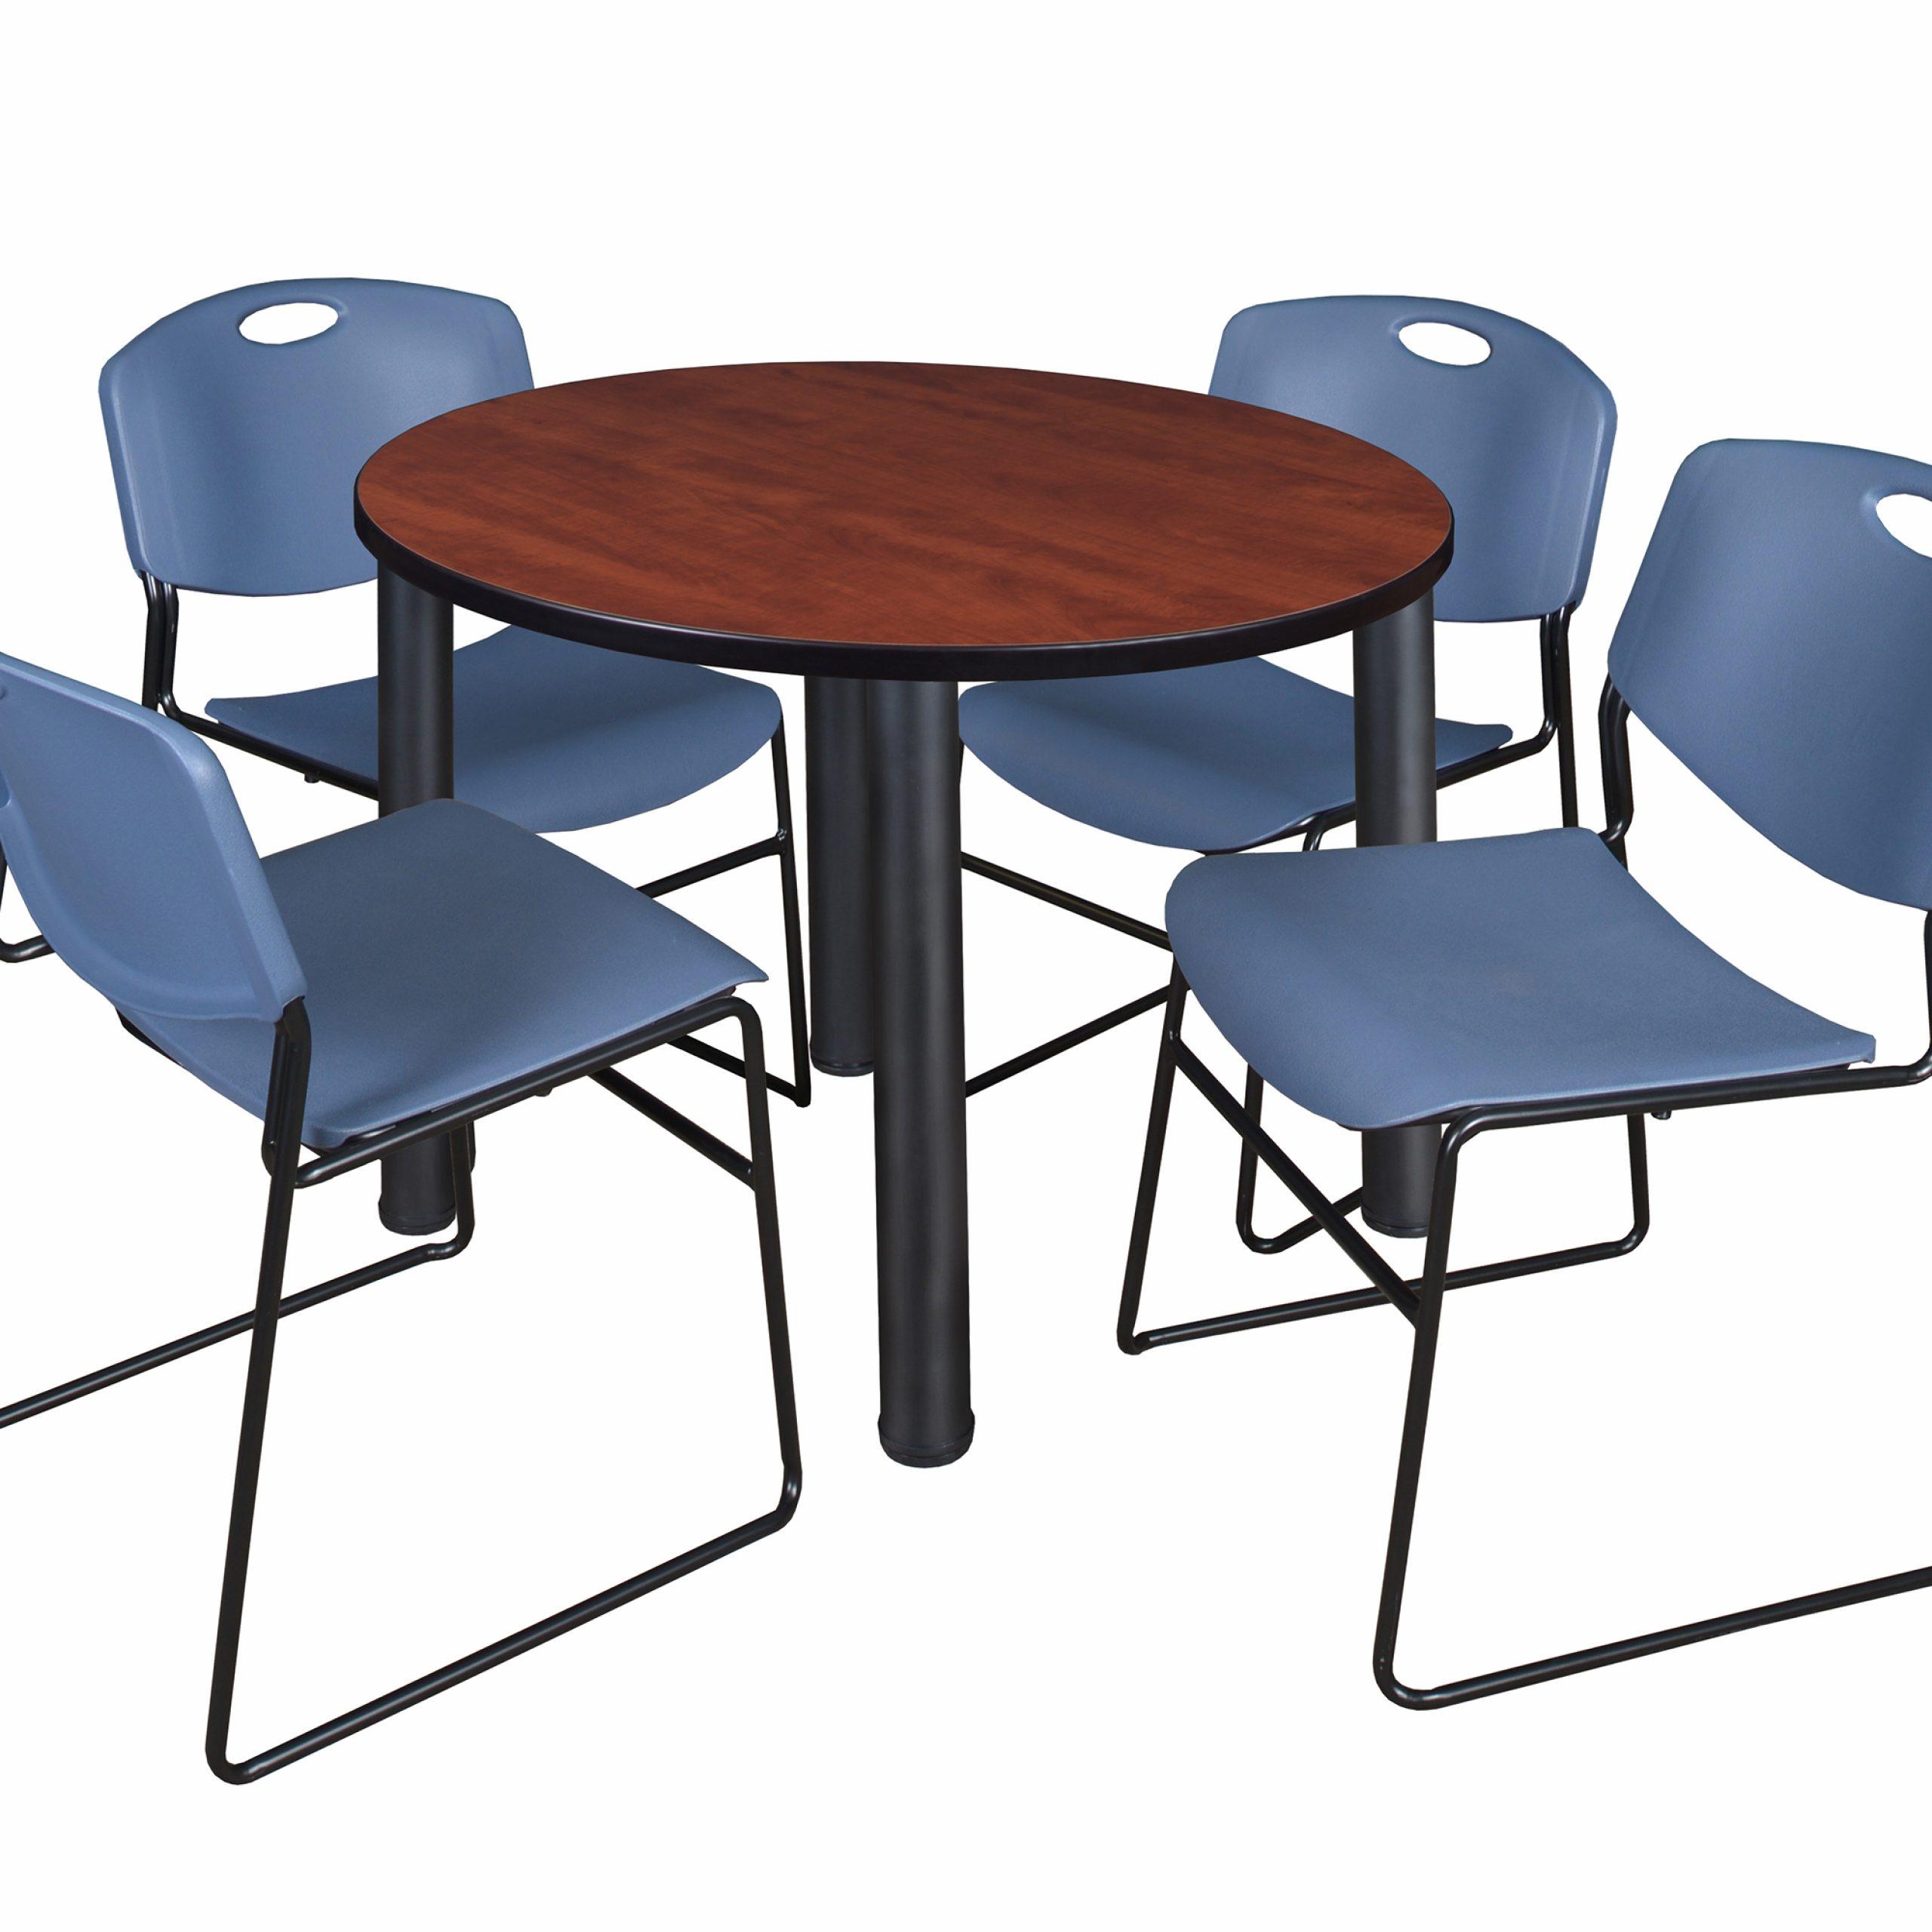 "Kee 42"" Round Breakroom Table Cherry/ Black & 4 Zeng Throughout Newest Mode Round Breakroom Tables (View 6 of 15)"